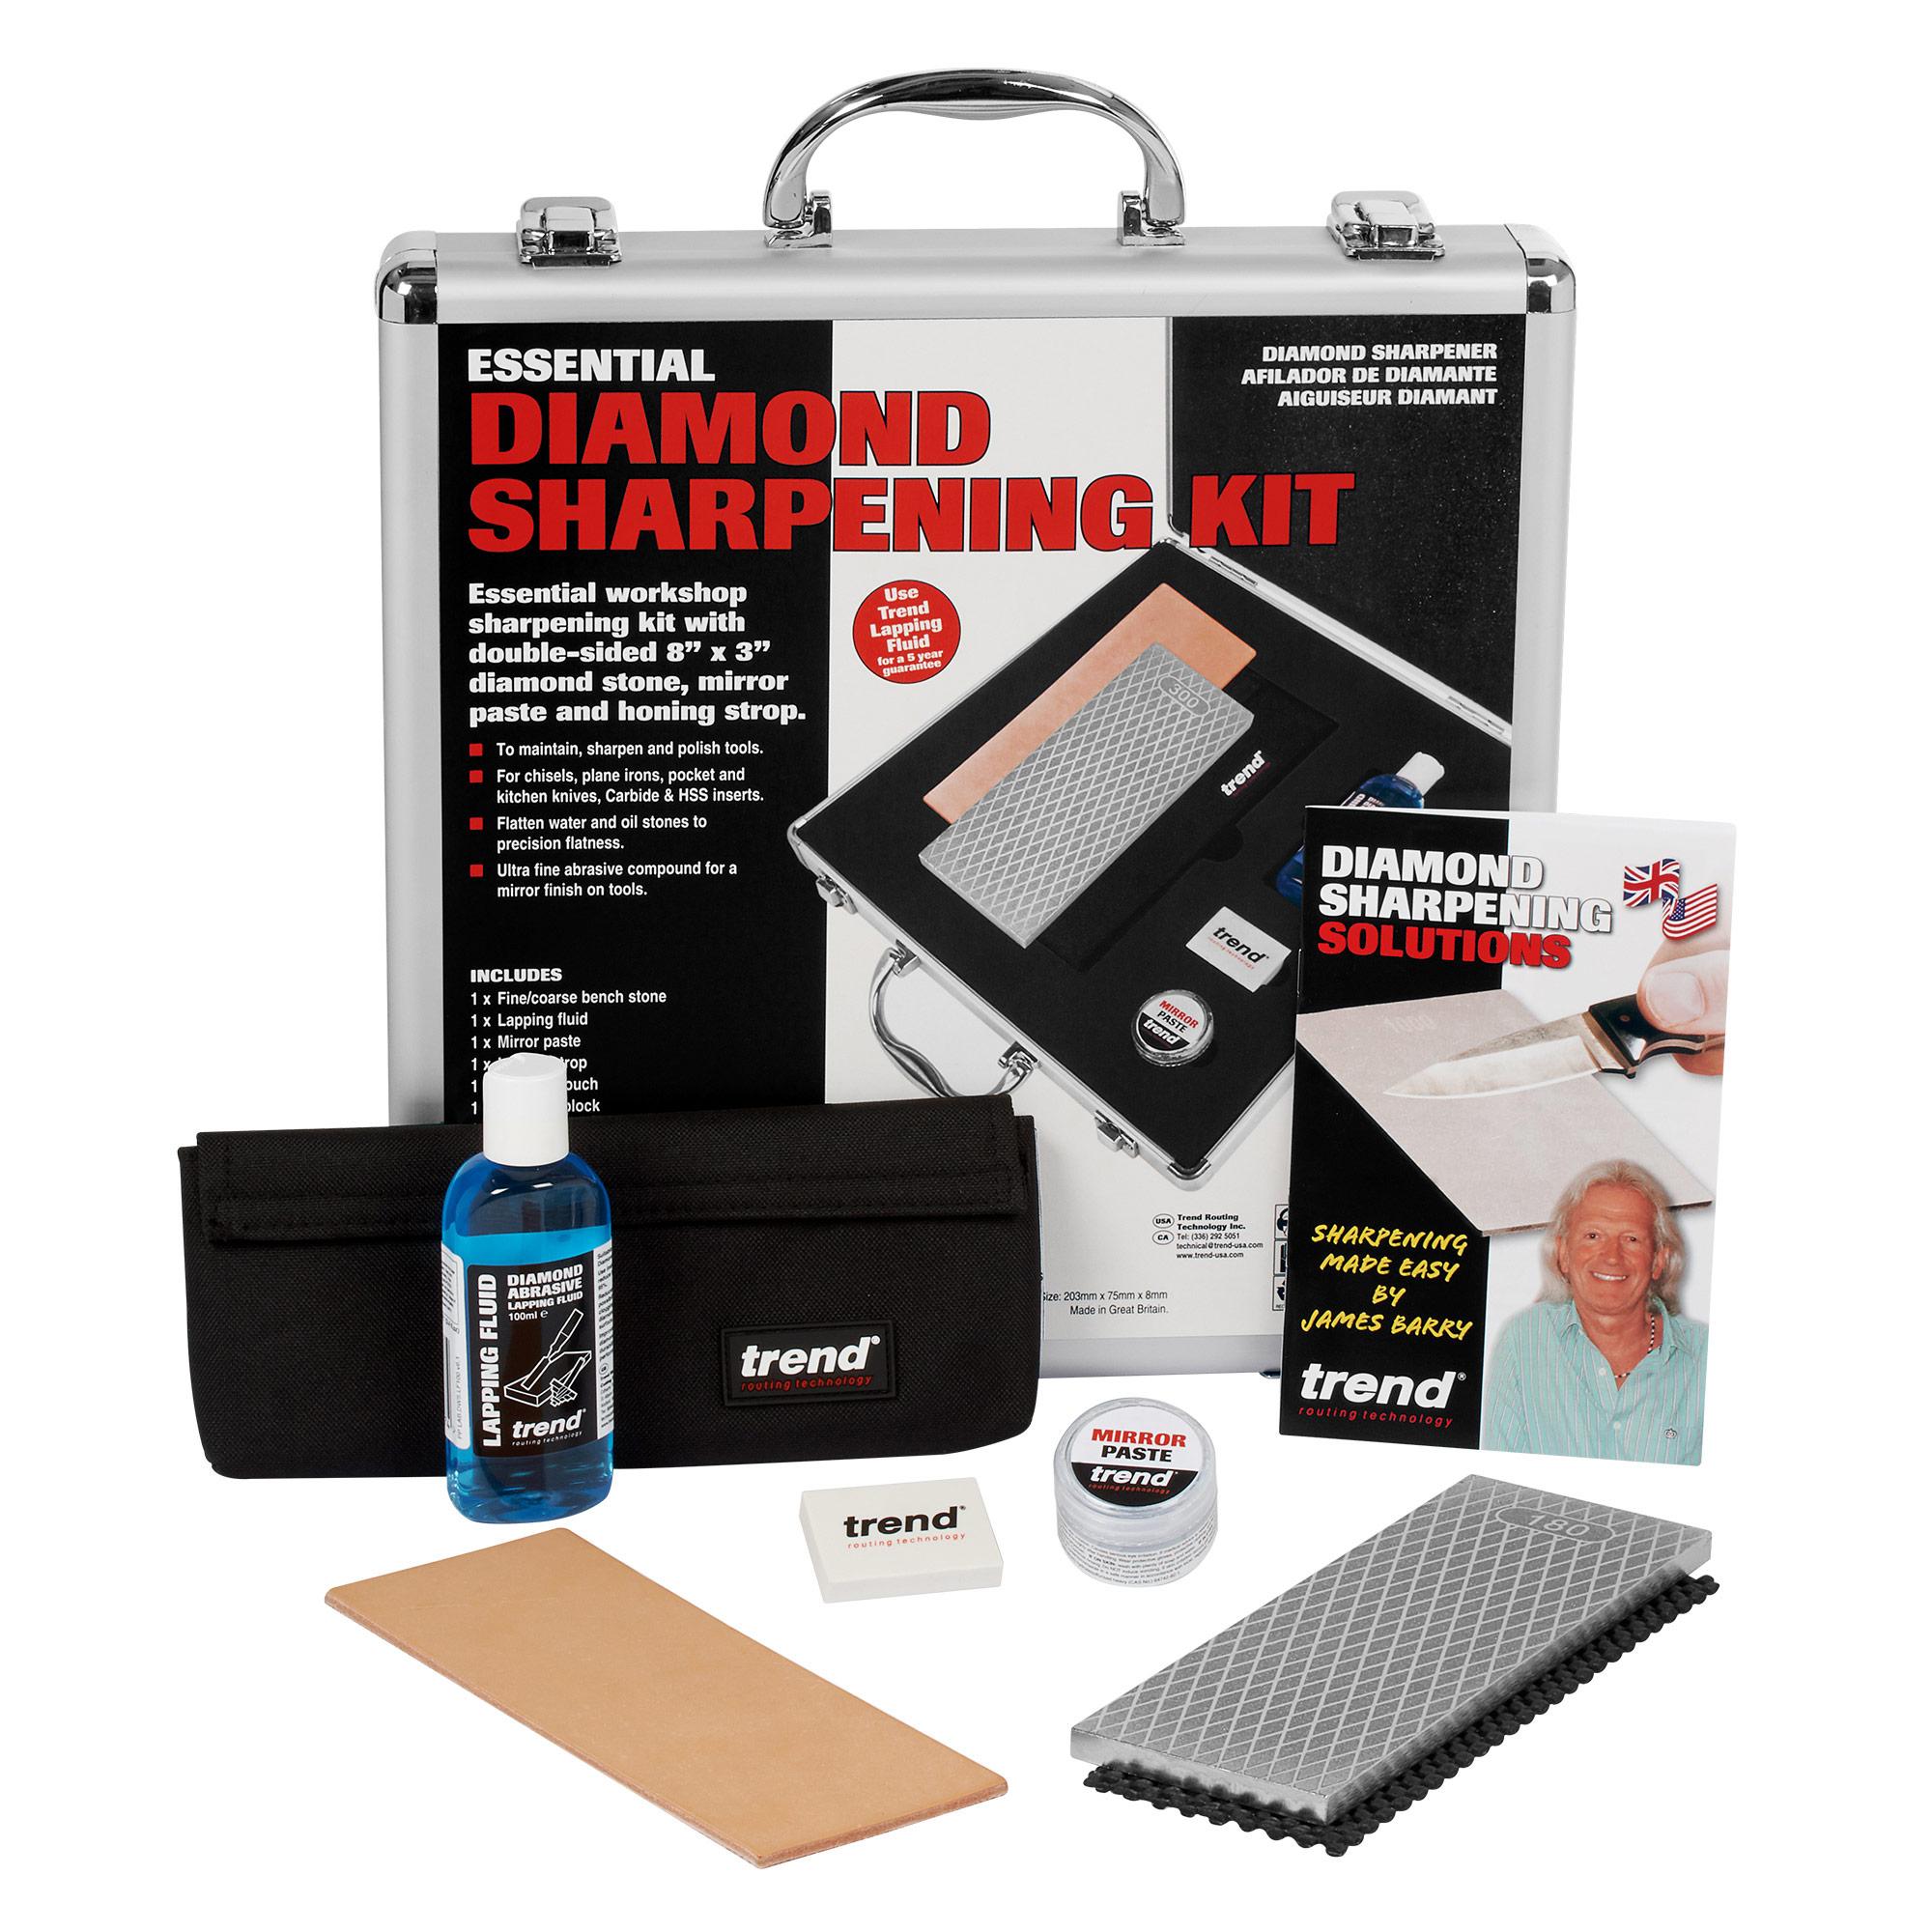 Essential Diamond Sharpening Kit